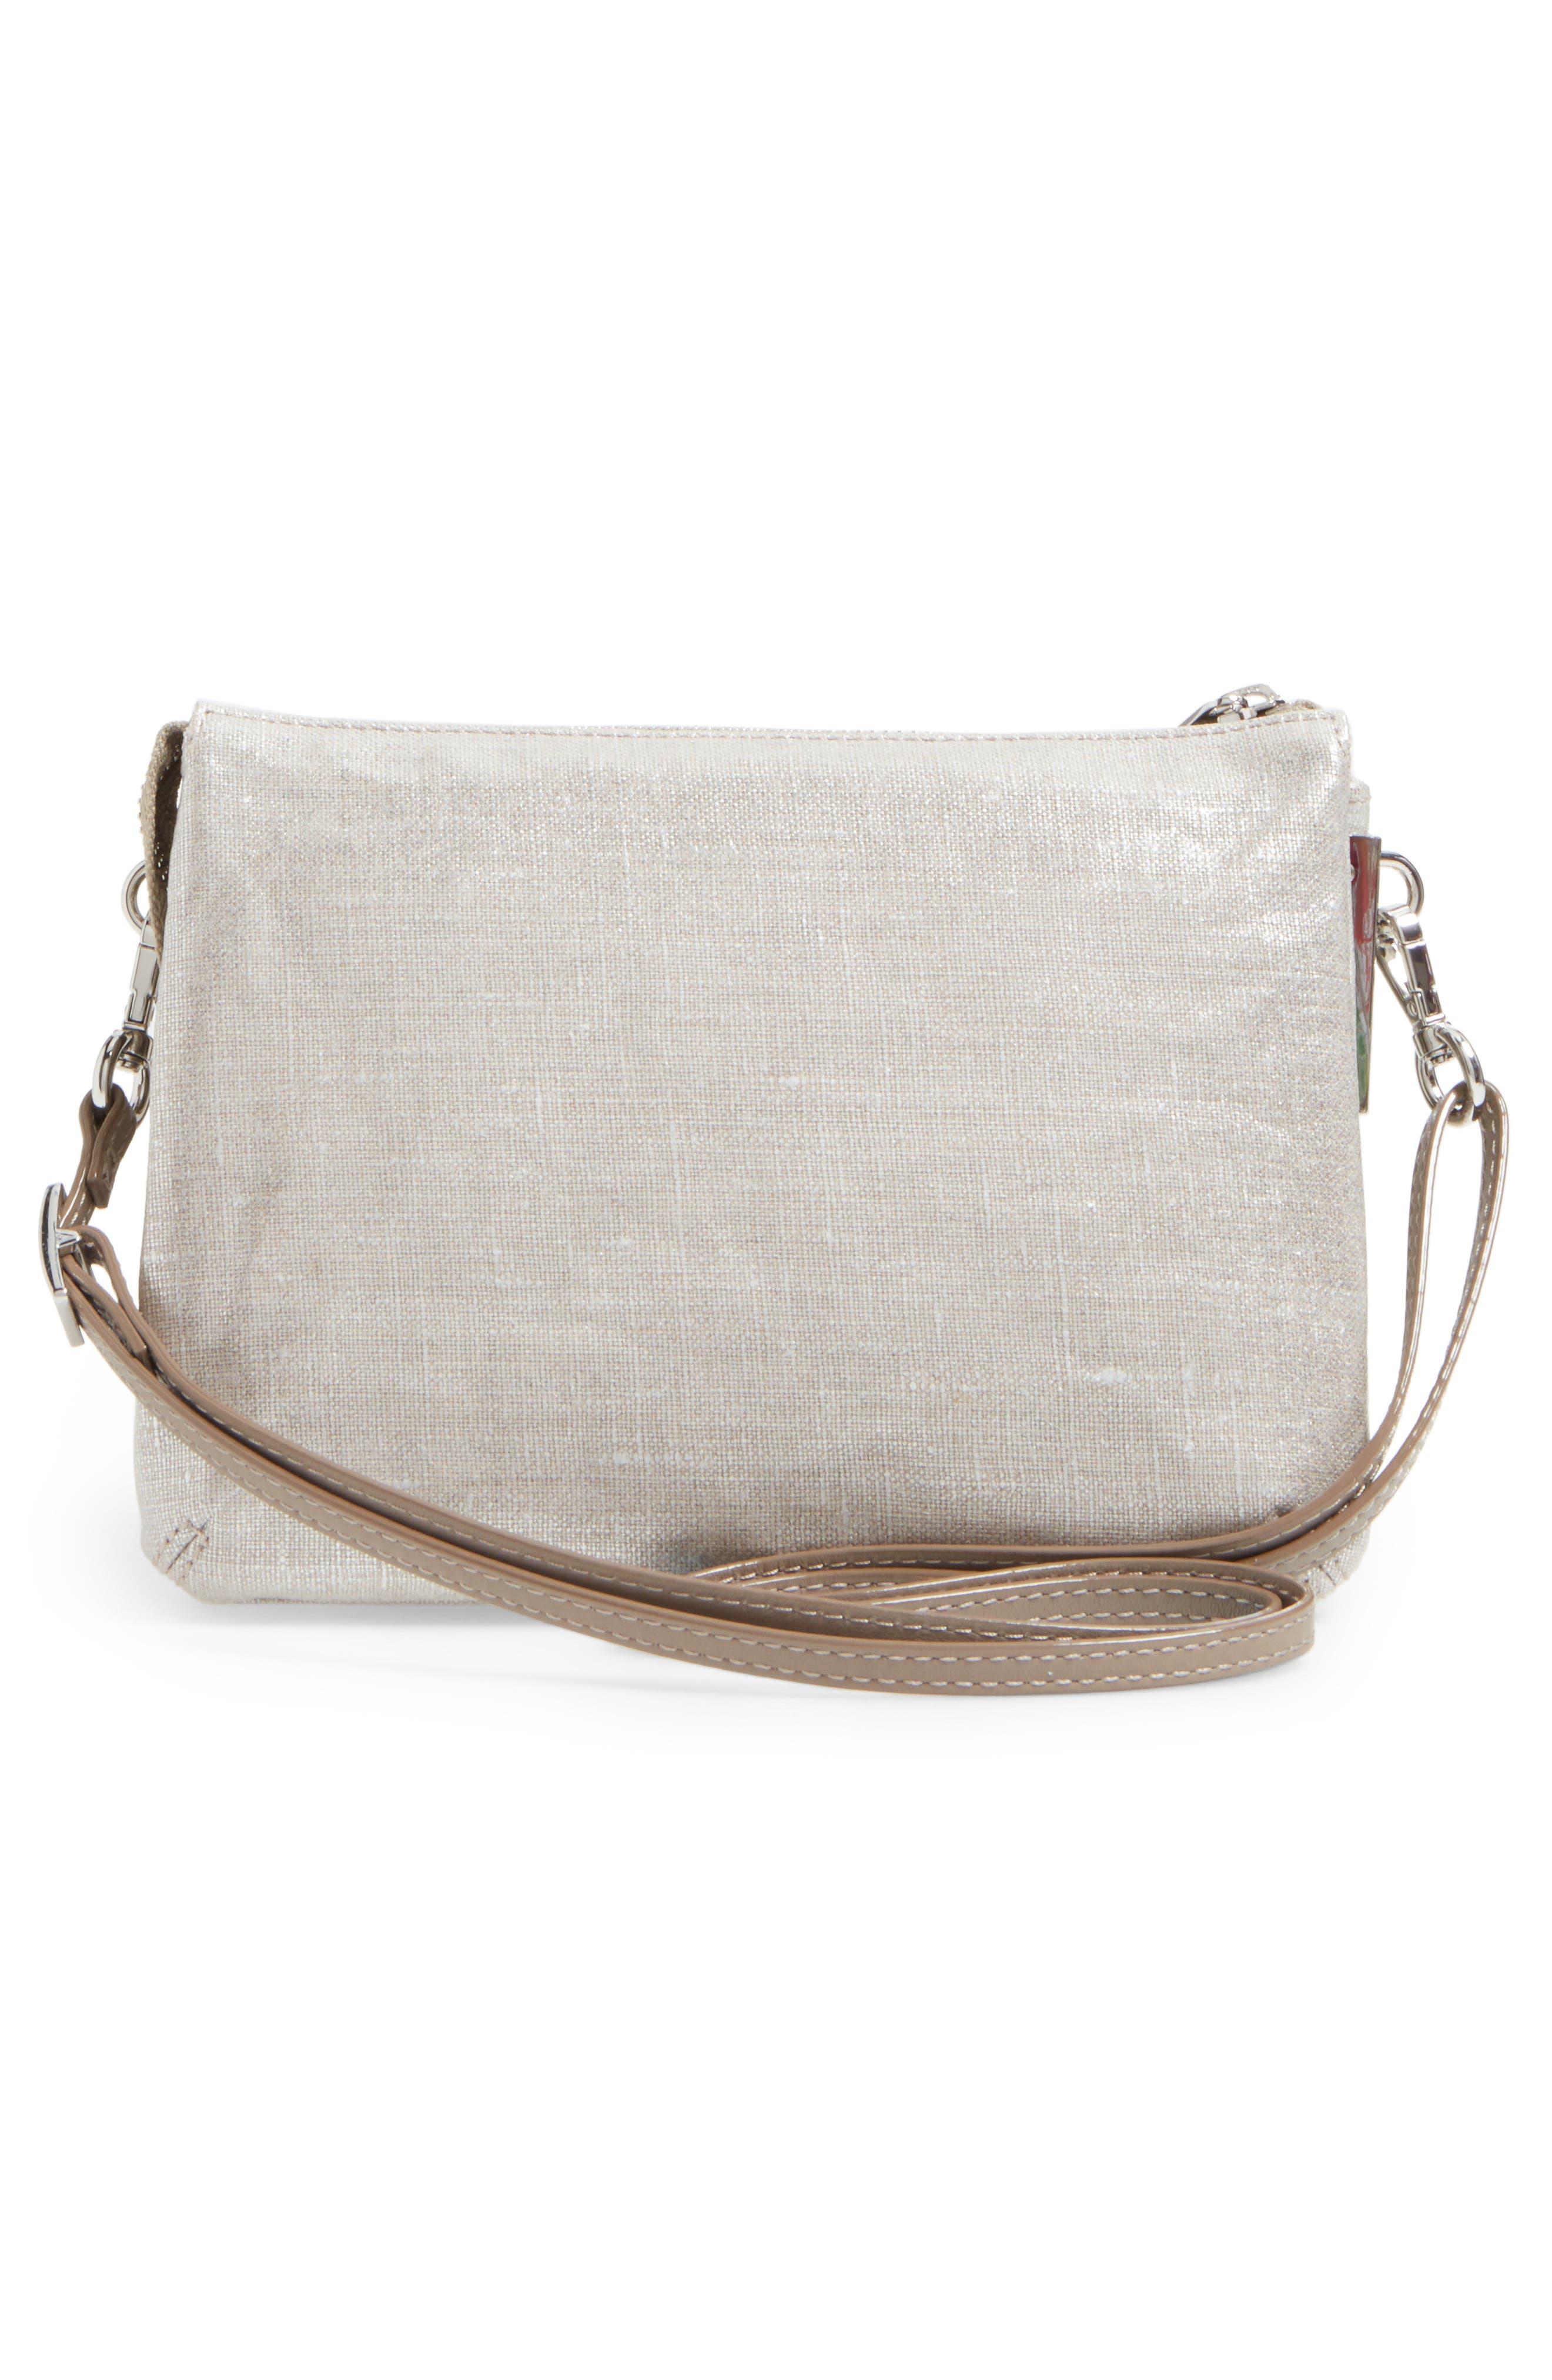 Alternate Image 3  - MZ Wallace 'Pippa' Bedford Nylon Crossbody Bag